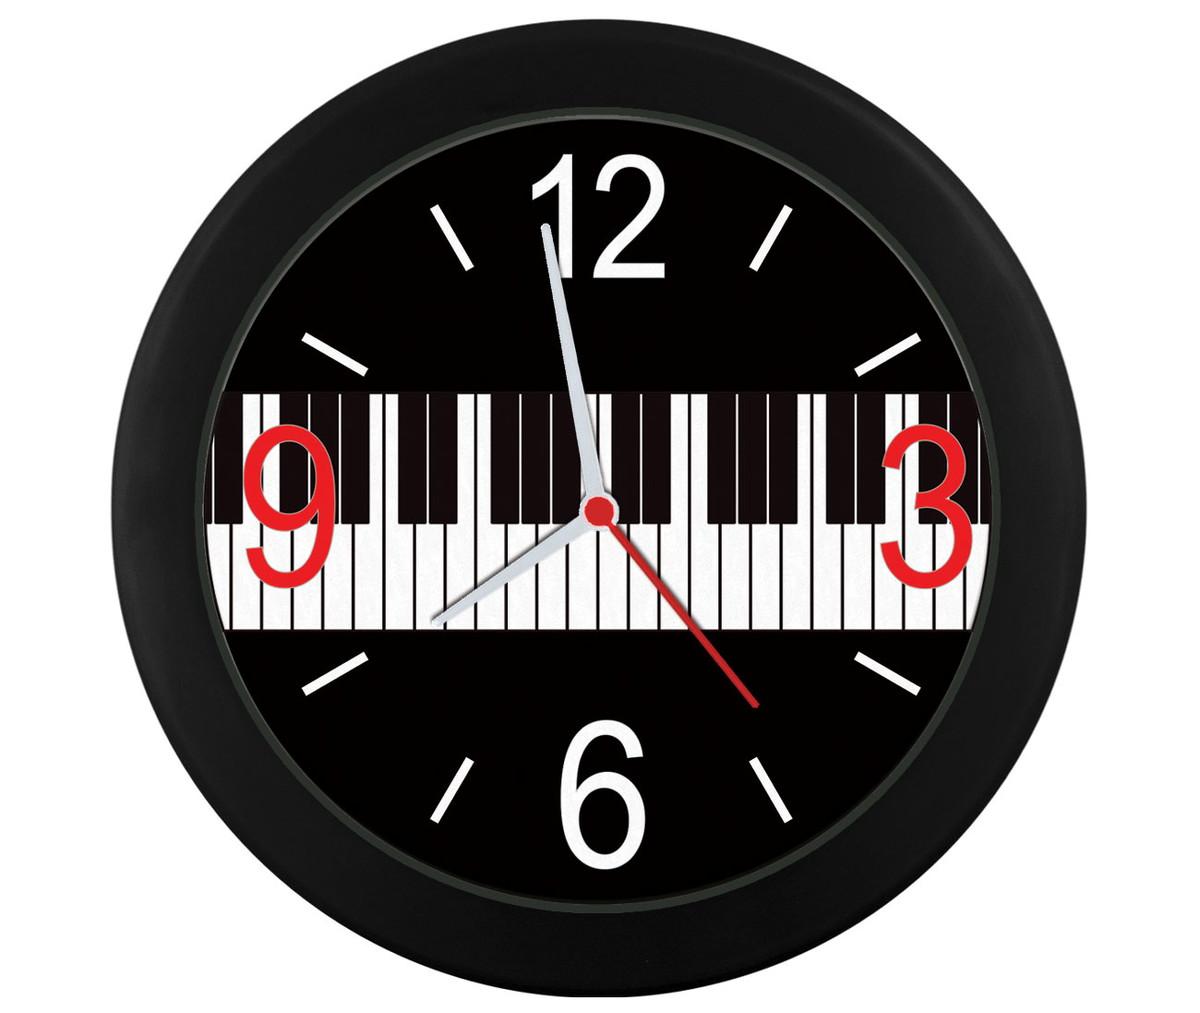 f86c4395b5a Relógio parede Teclas piano no Elo7